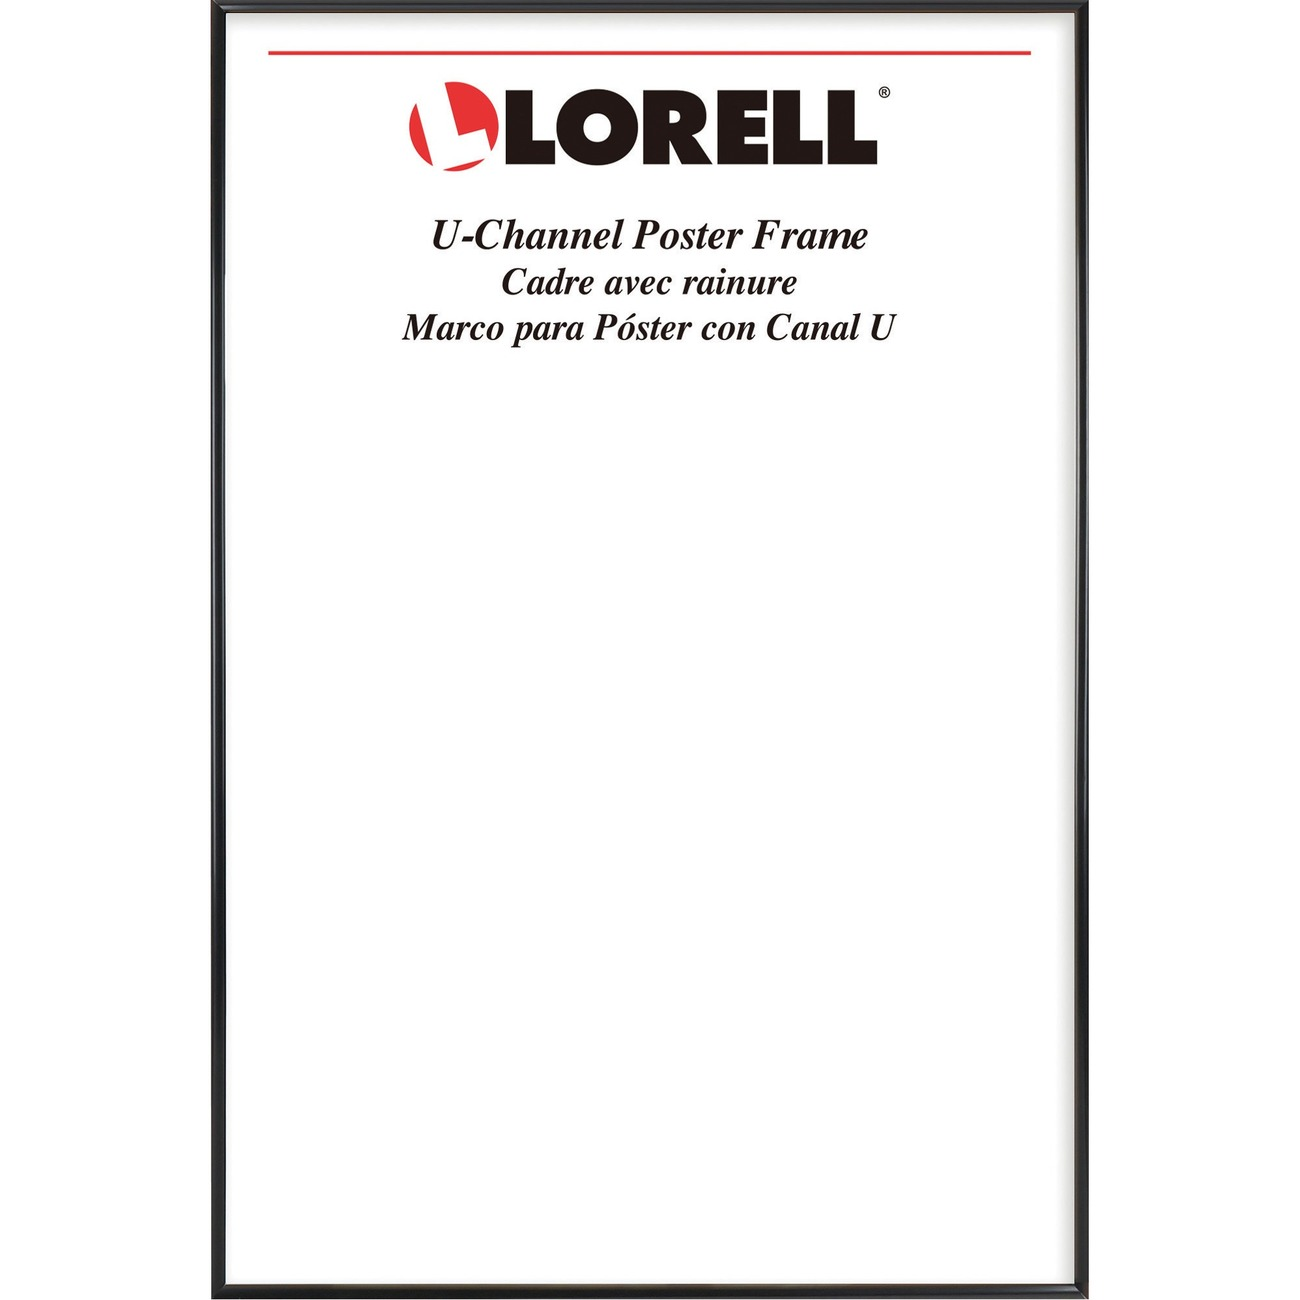 lorell poster frame 18 x 24 frame size rectangle horizontal vertical 1 each black item 7424268